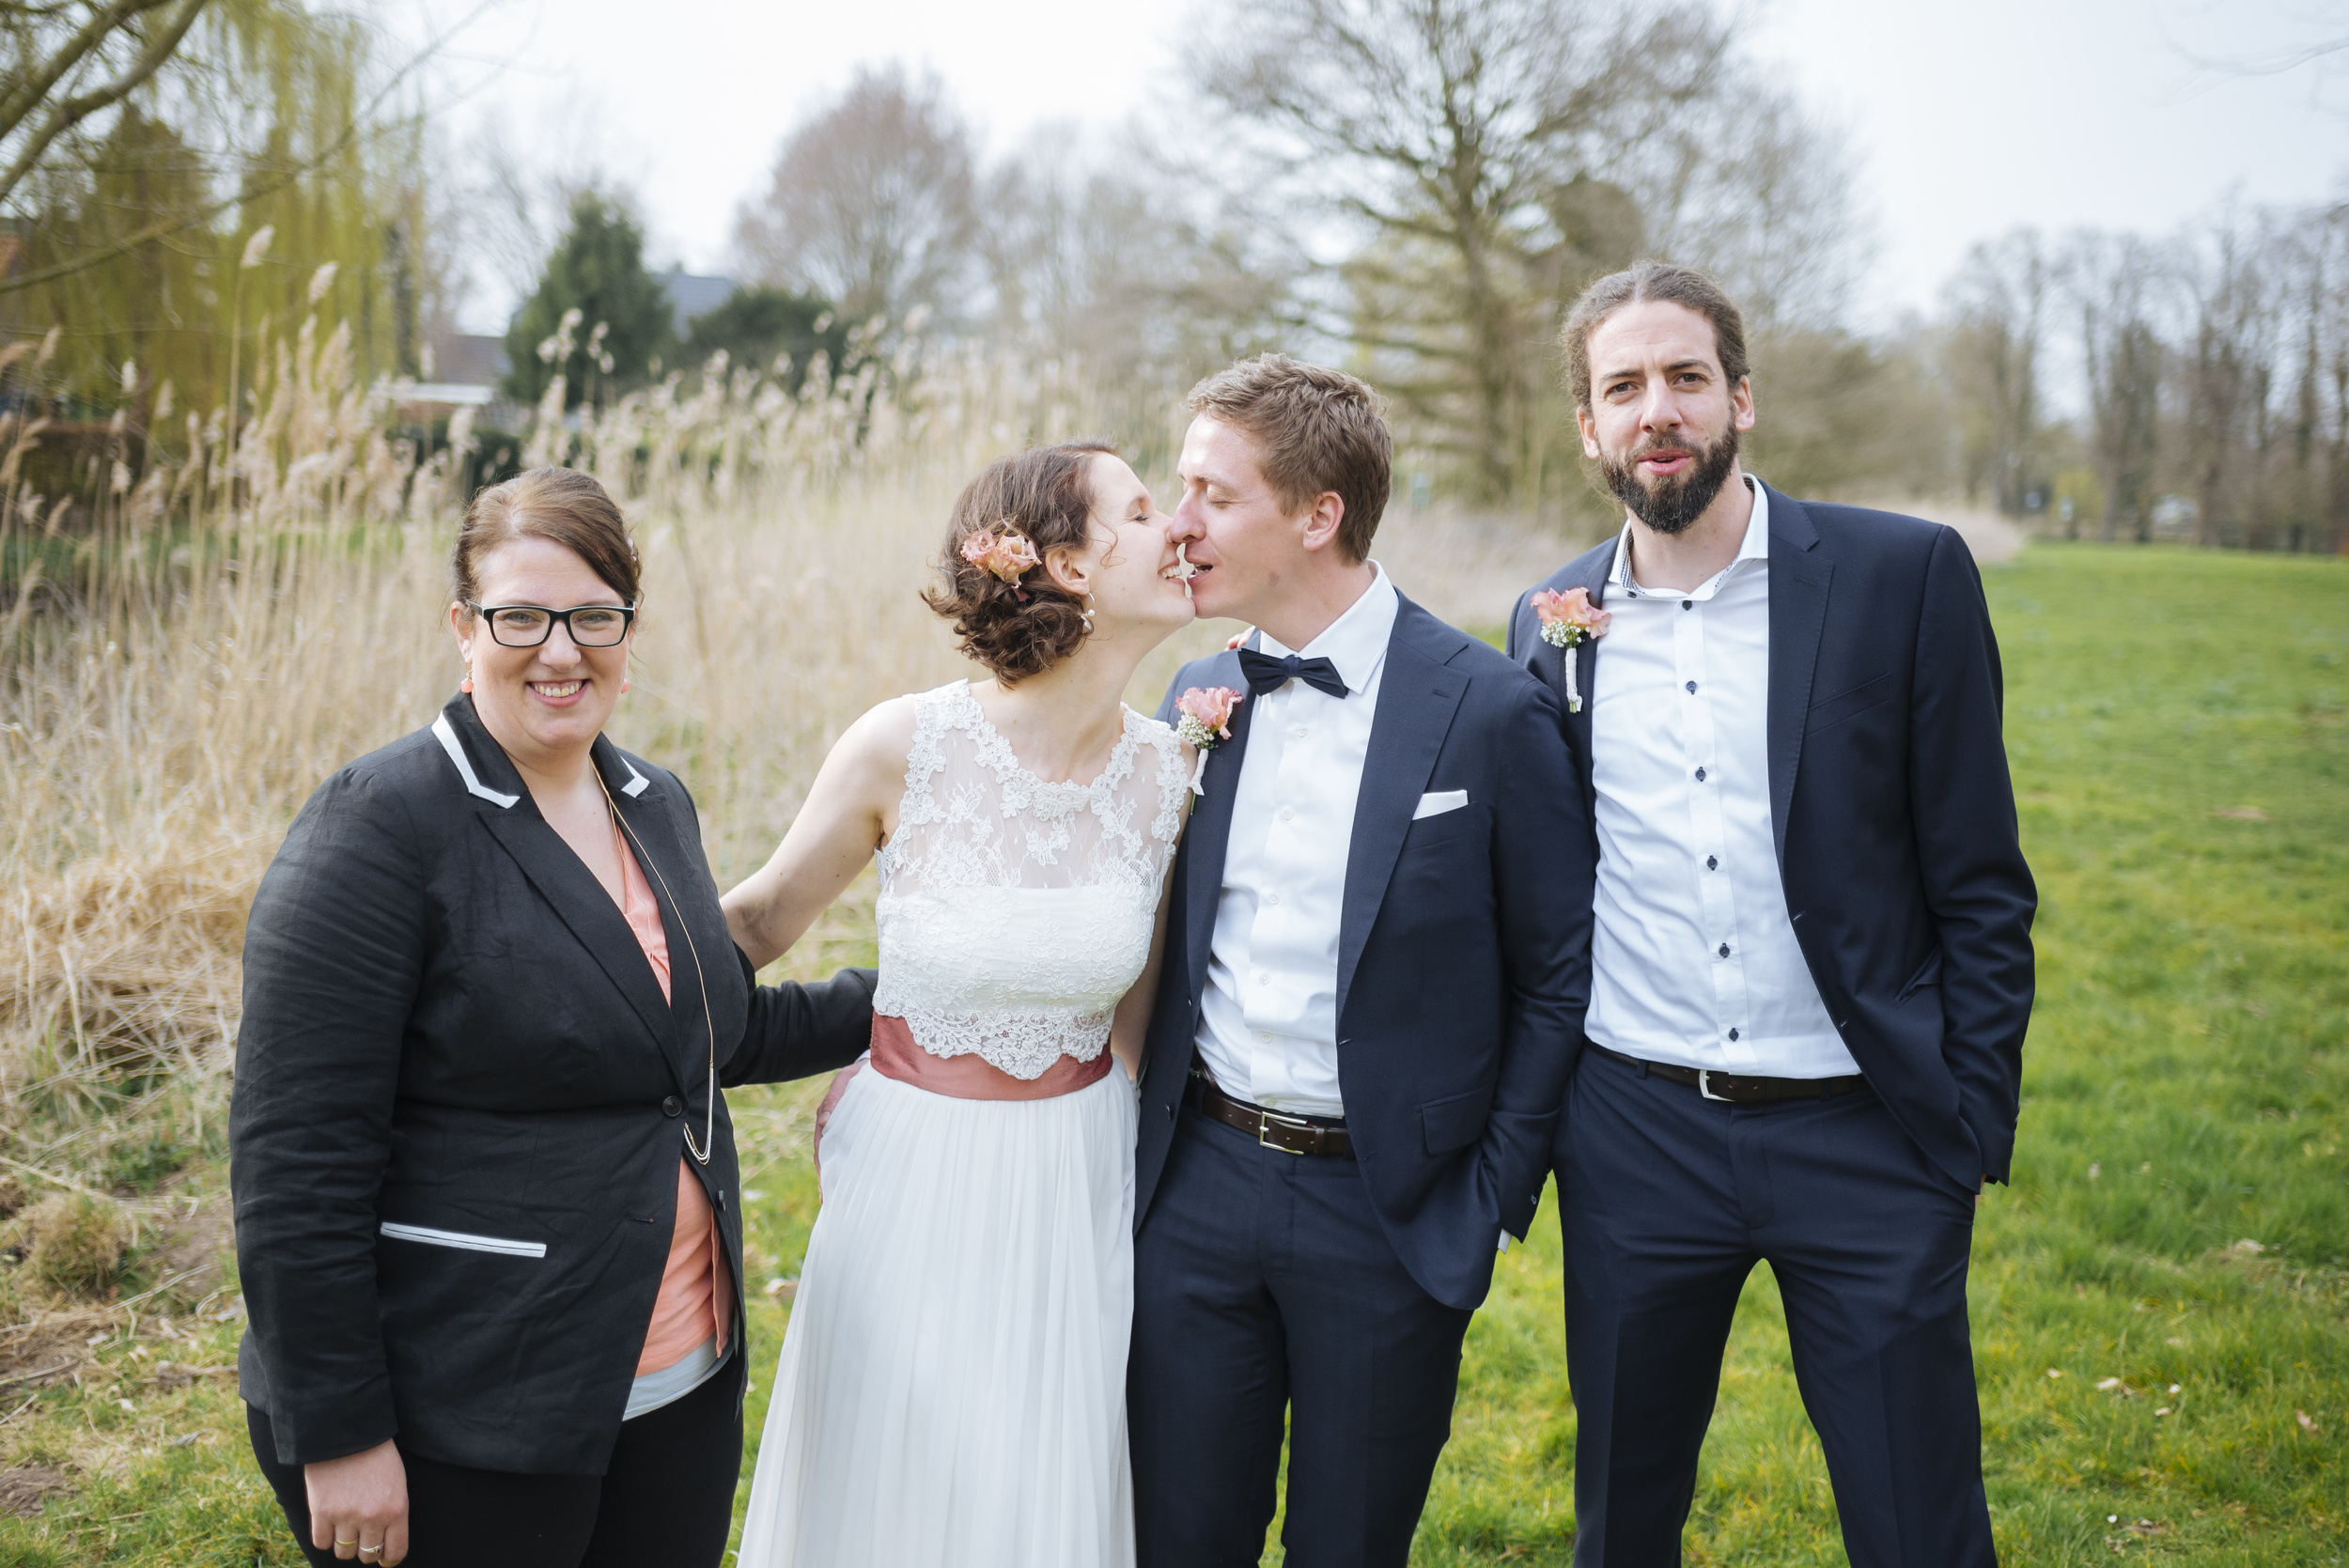 Hochzeitsfotograf-Schlossruine-Hertefeld-Weeze-117.jpg